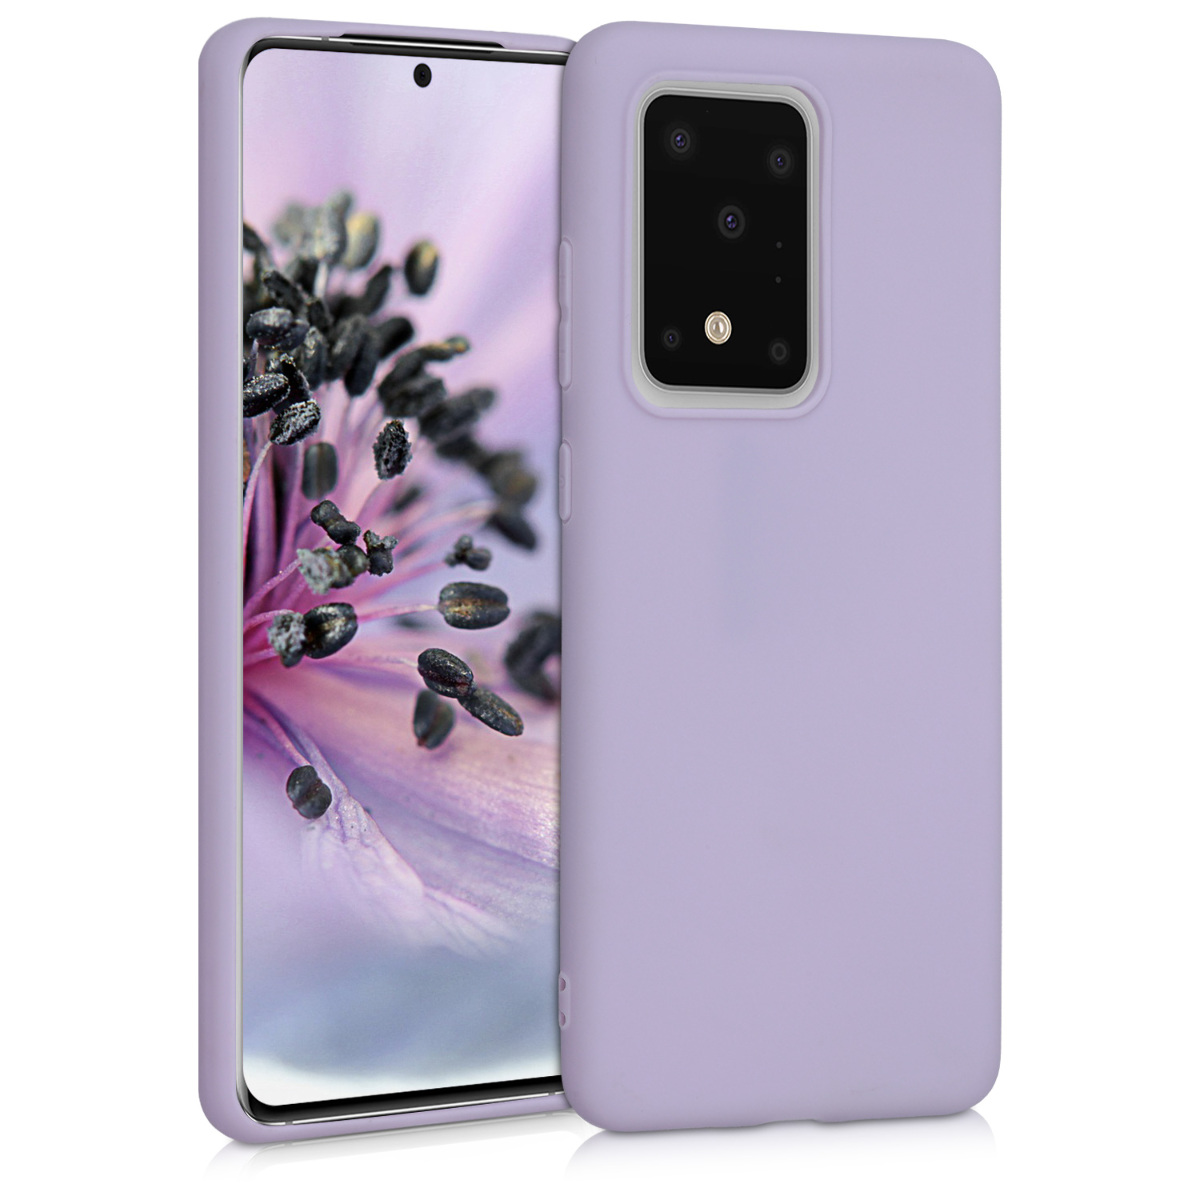 KW Θήκη Σιλικόνης Samsung Galaxy S20 Ultra - Lavender (51225.108)